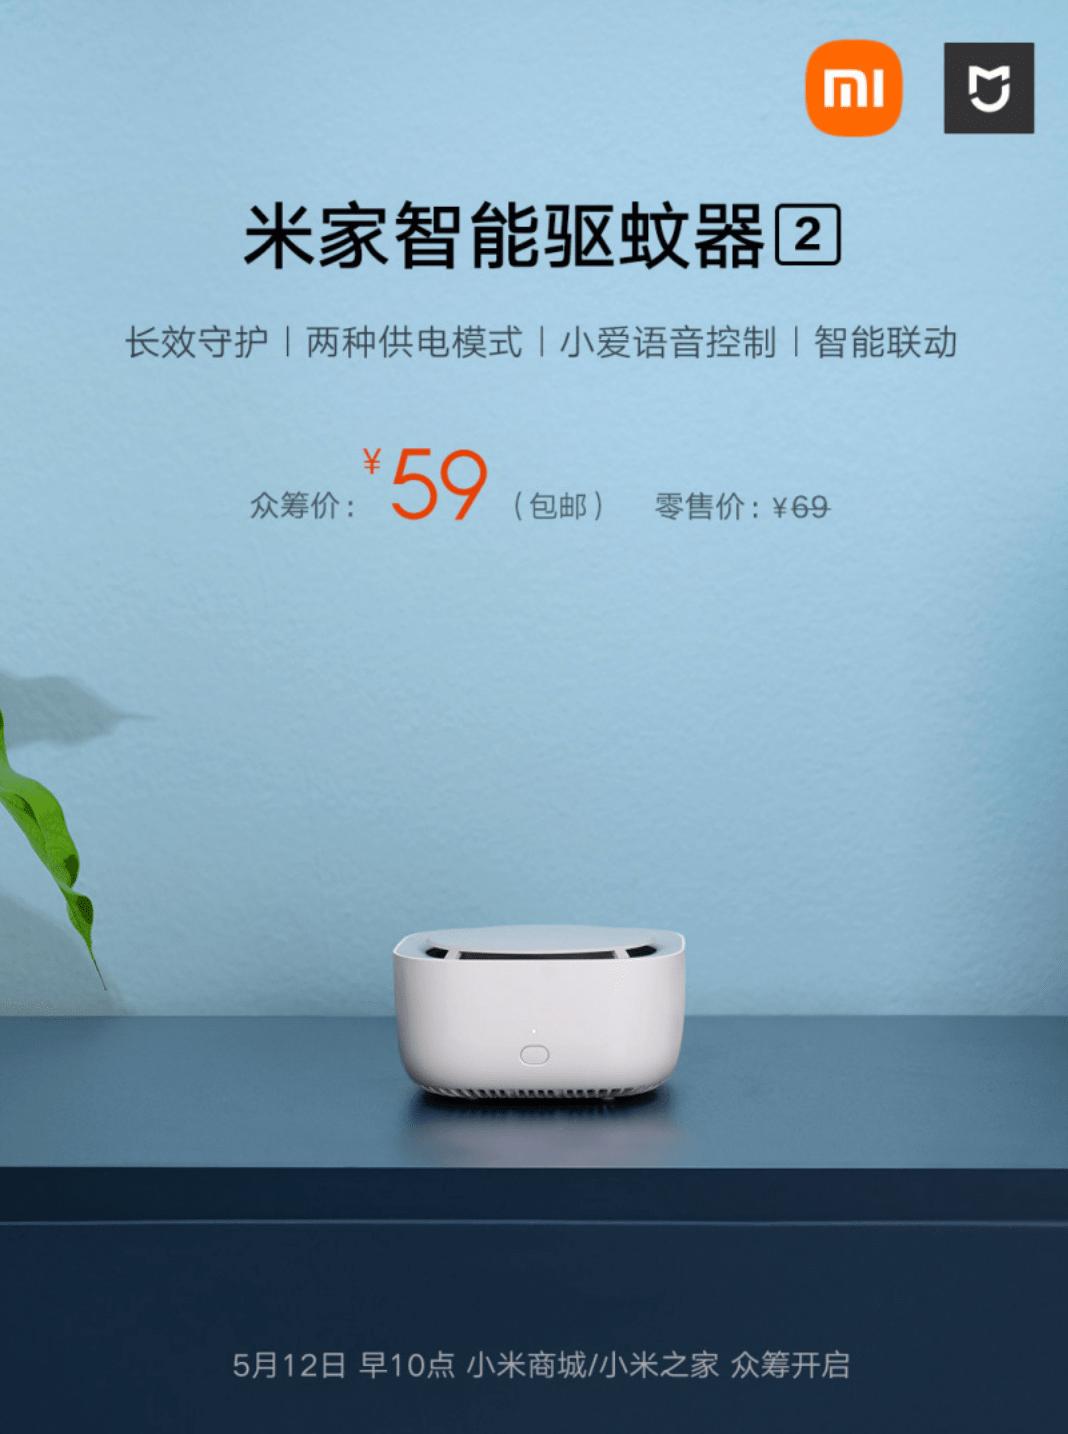 Repelente de mosquitos inteligente Xiaomi 2 India